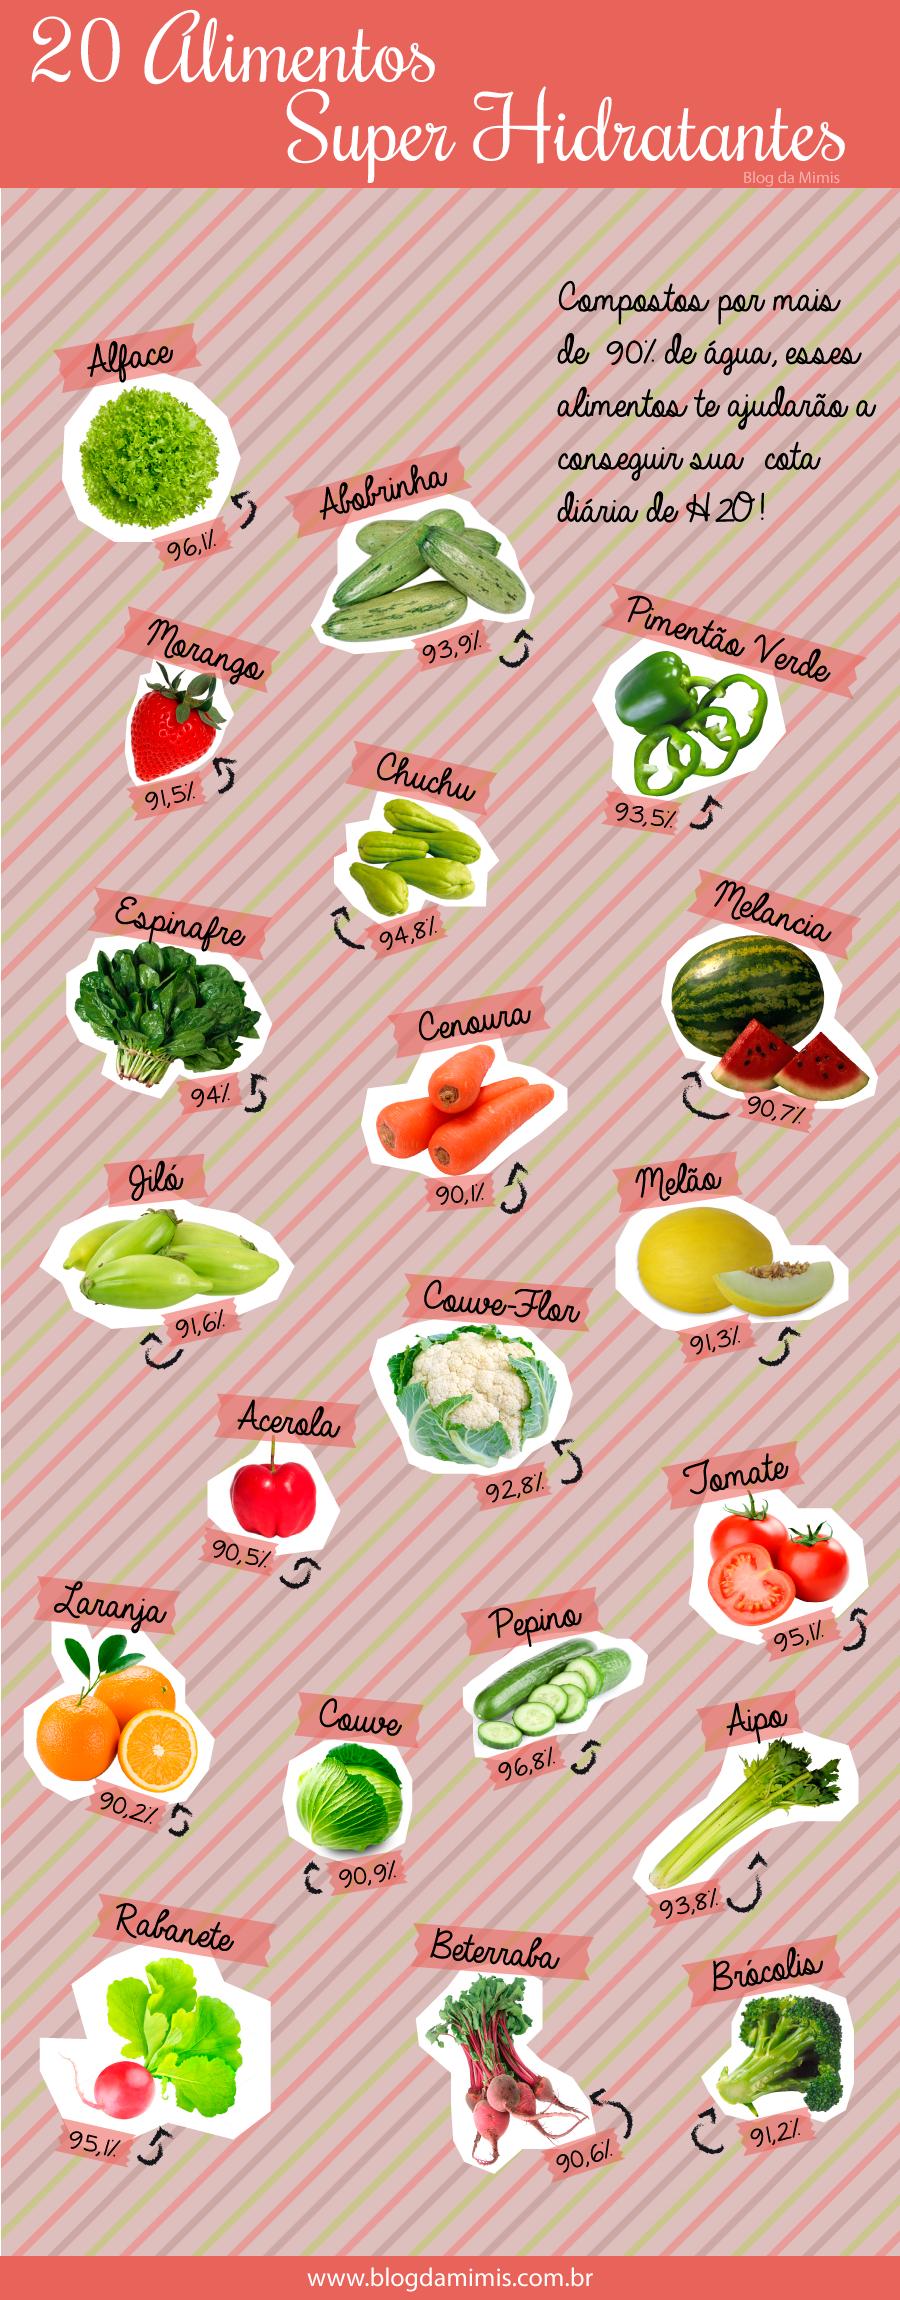 20-Alimentos-Super-Hidratantes